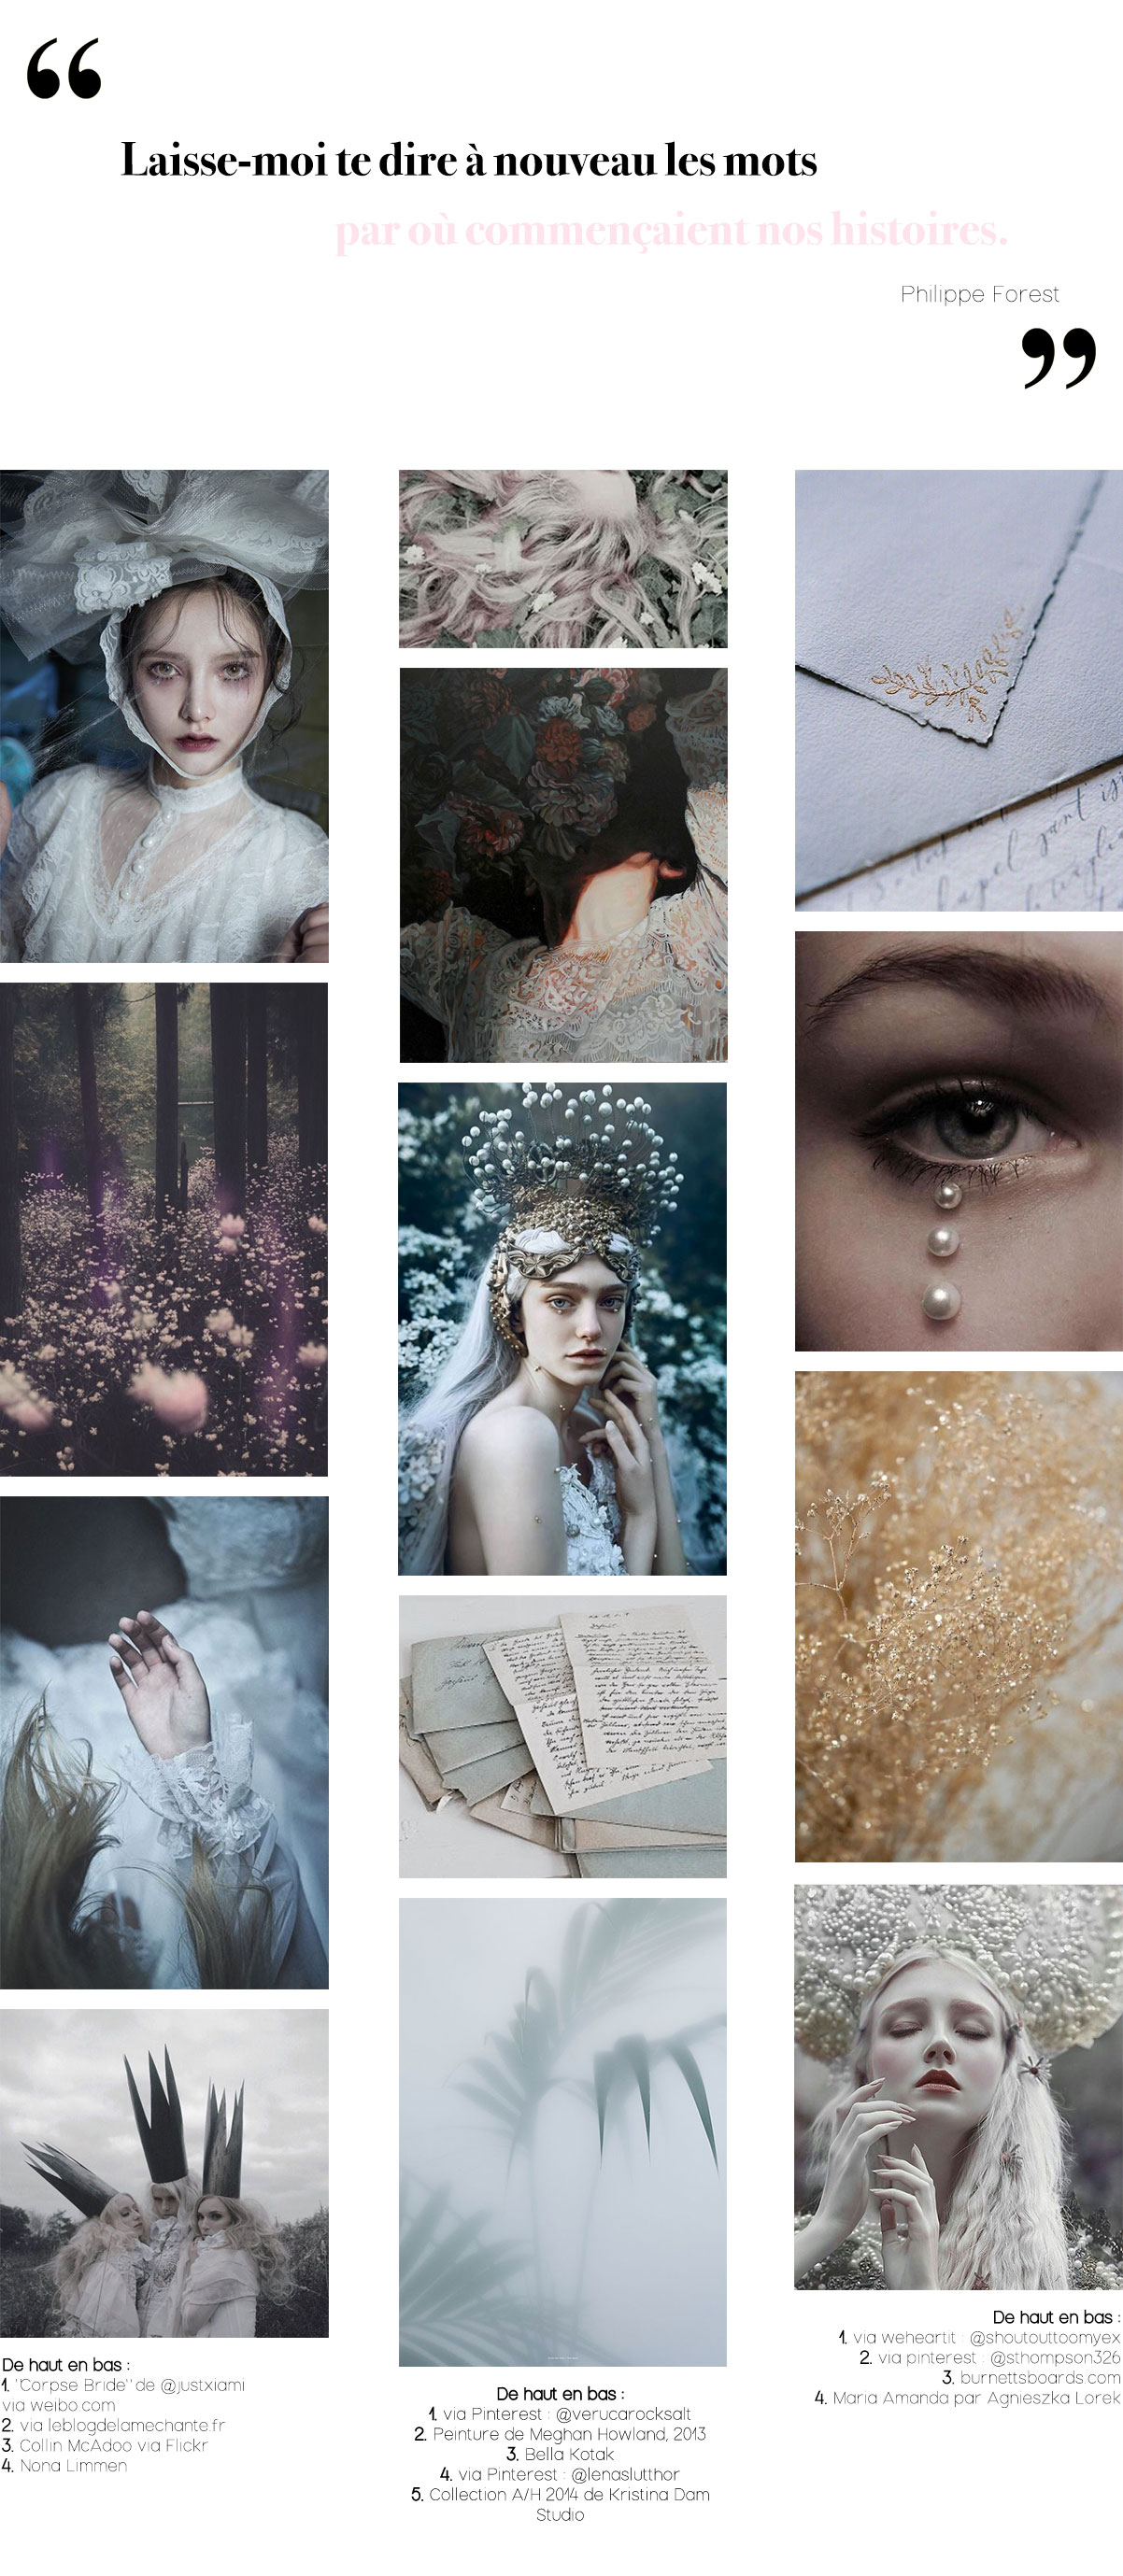 Inspirations Pinterest #10 : Histoires Imaginaires